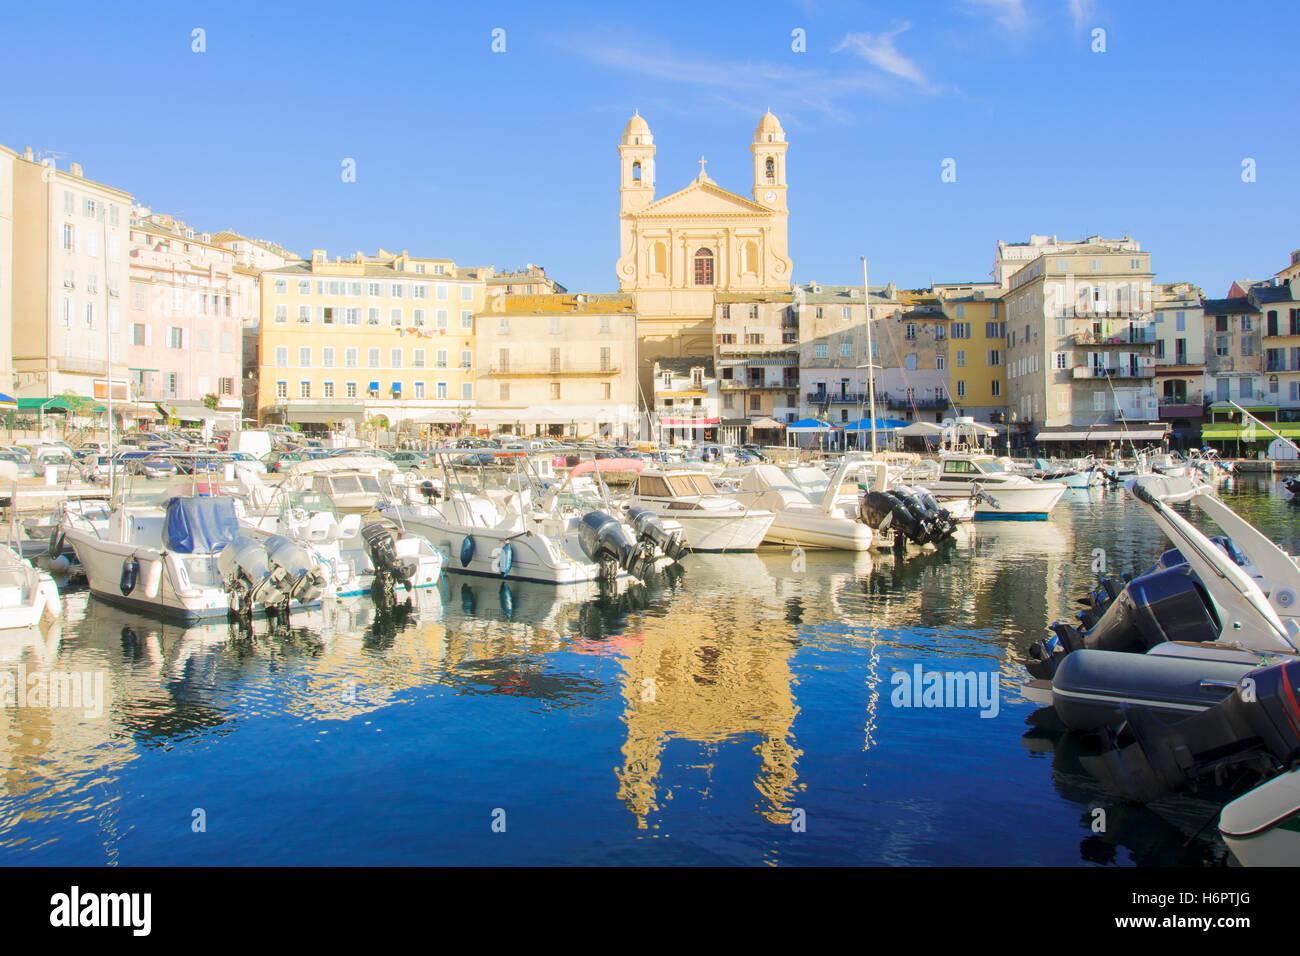 Szene auf den alten Hafen (Vieux Port) in Bastia, Korsika, Frankreich. Stockbild